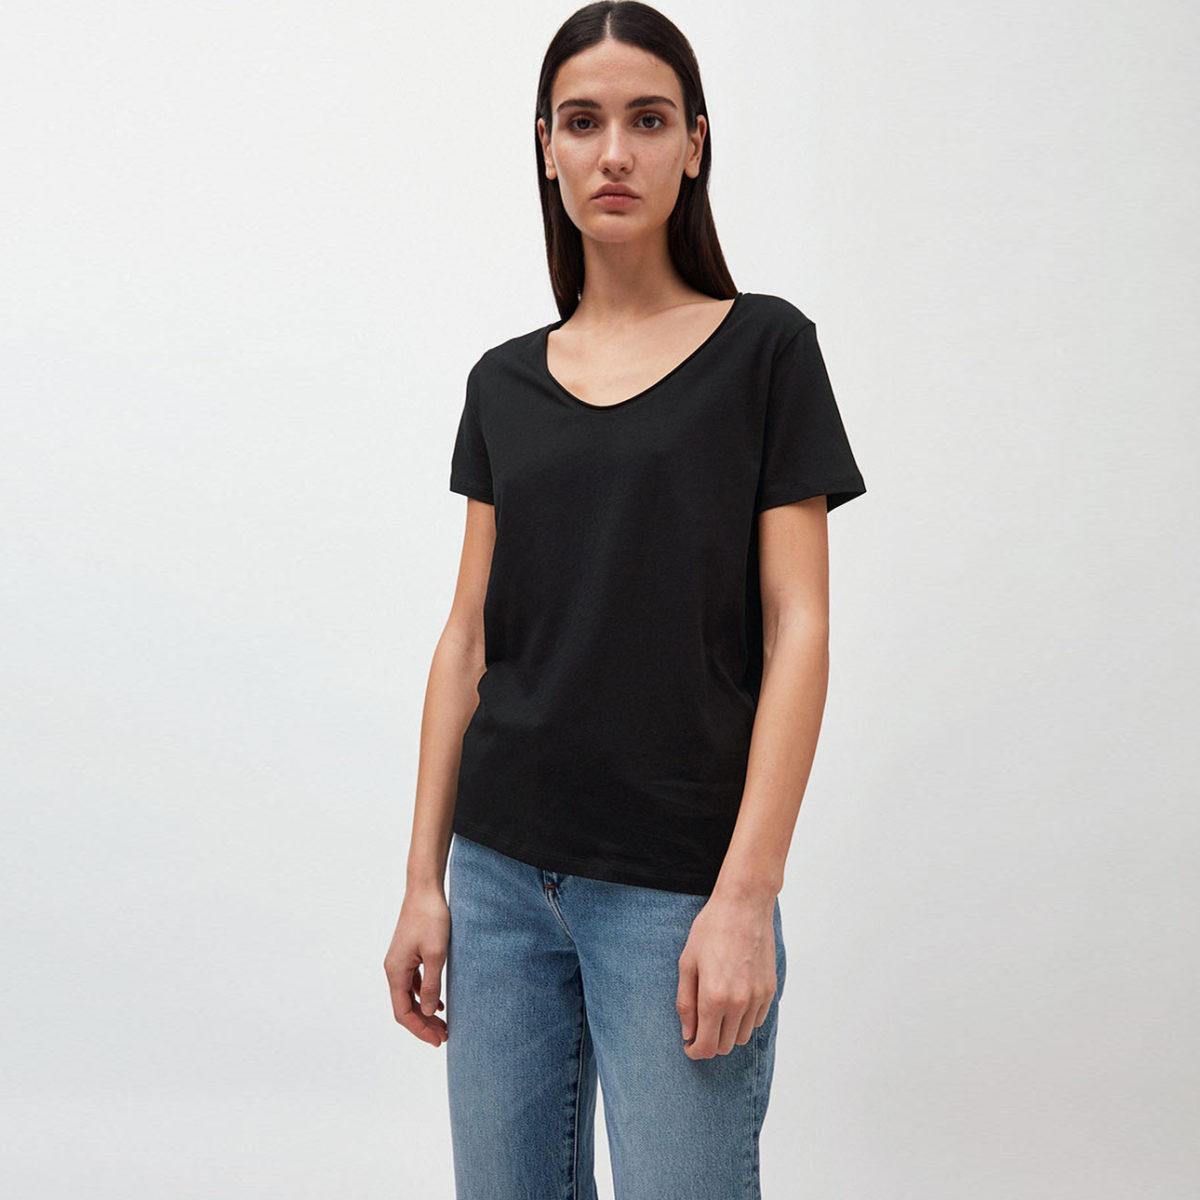 T-shirt från Armedangels i 100% ekologisk bomull GOTS